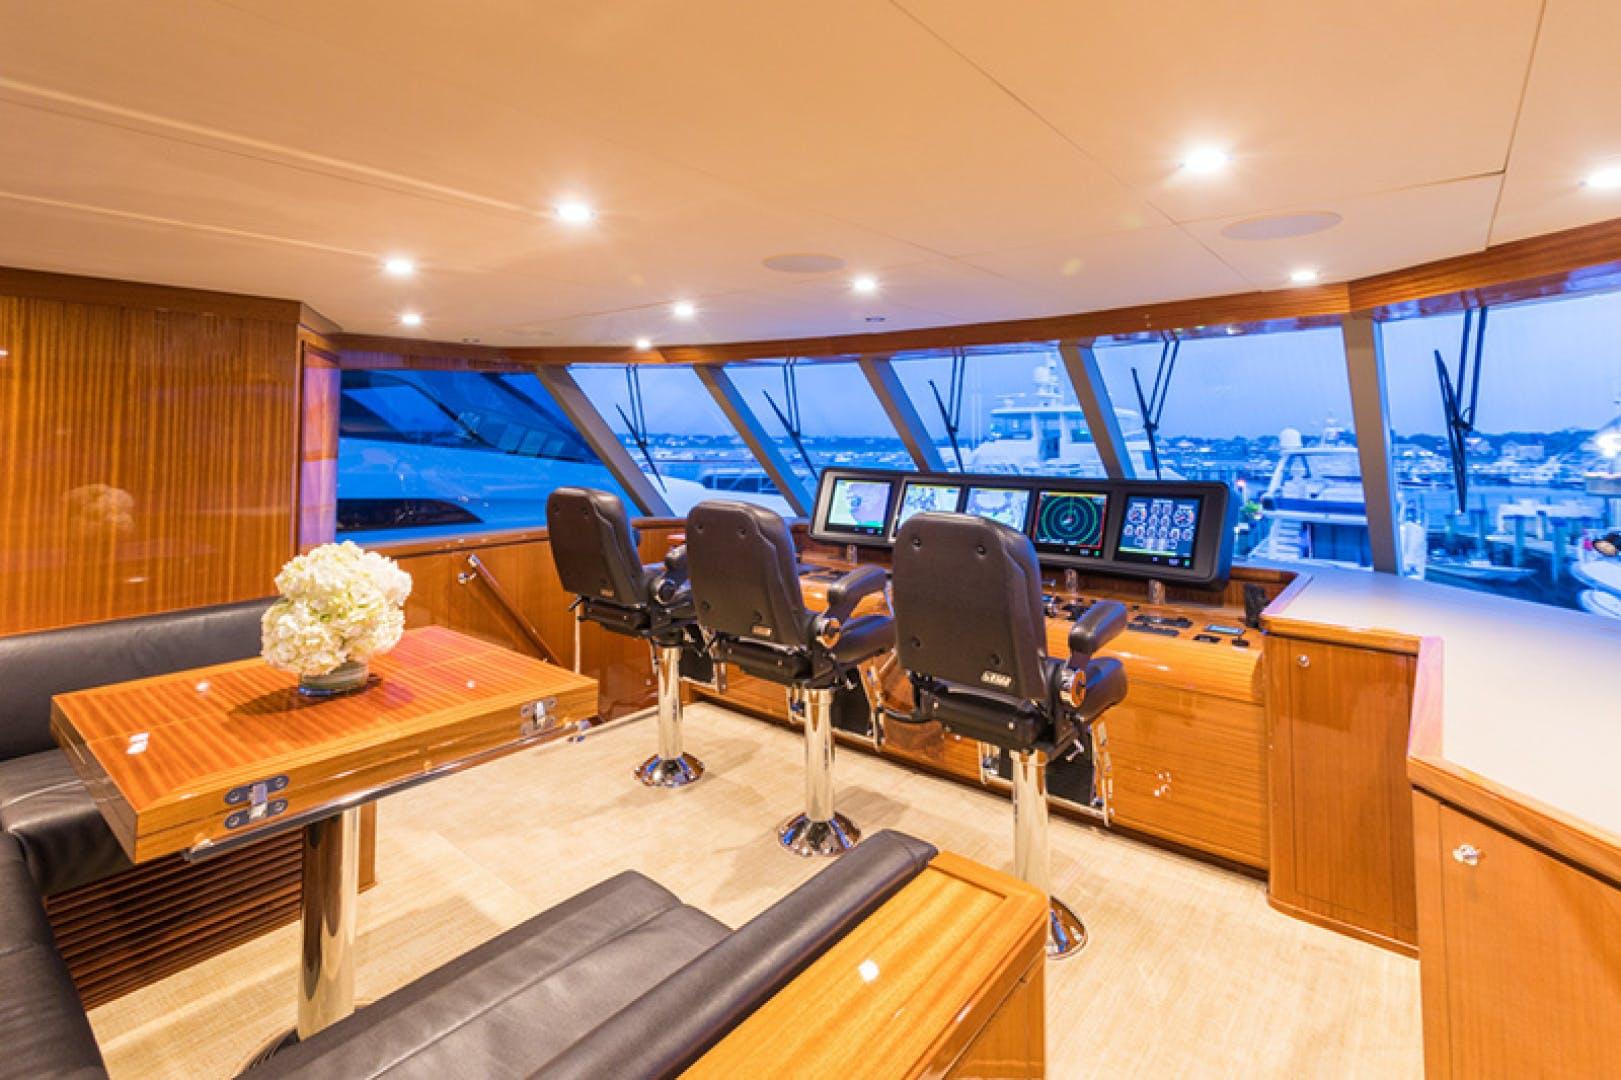 2014 Ocean Alexander 78' 78 Enclosed Bridge ANN LOUISE | Picture 8 of 39